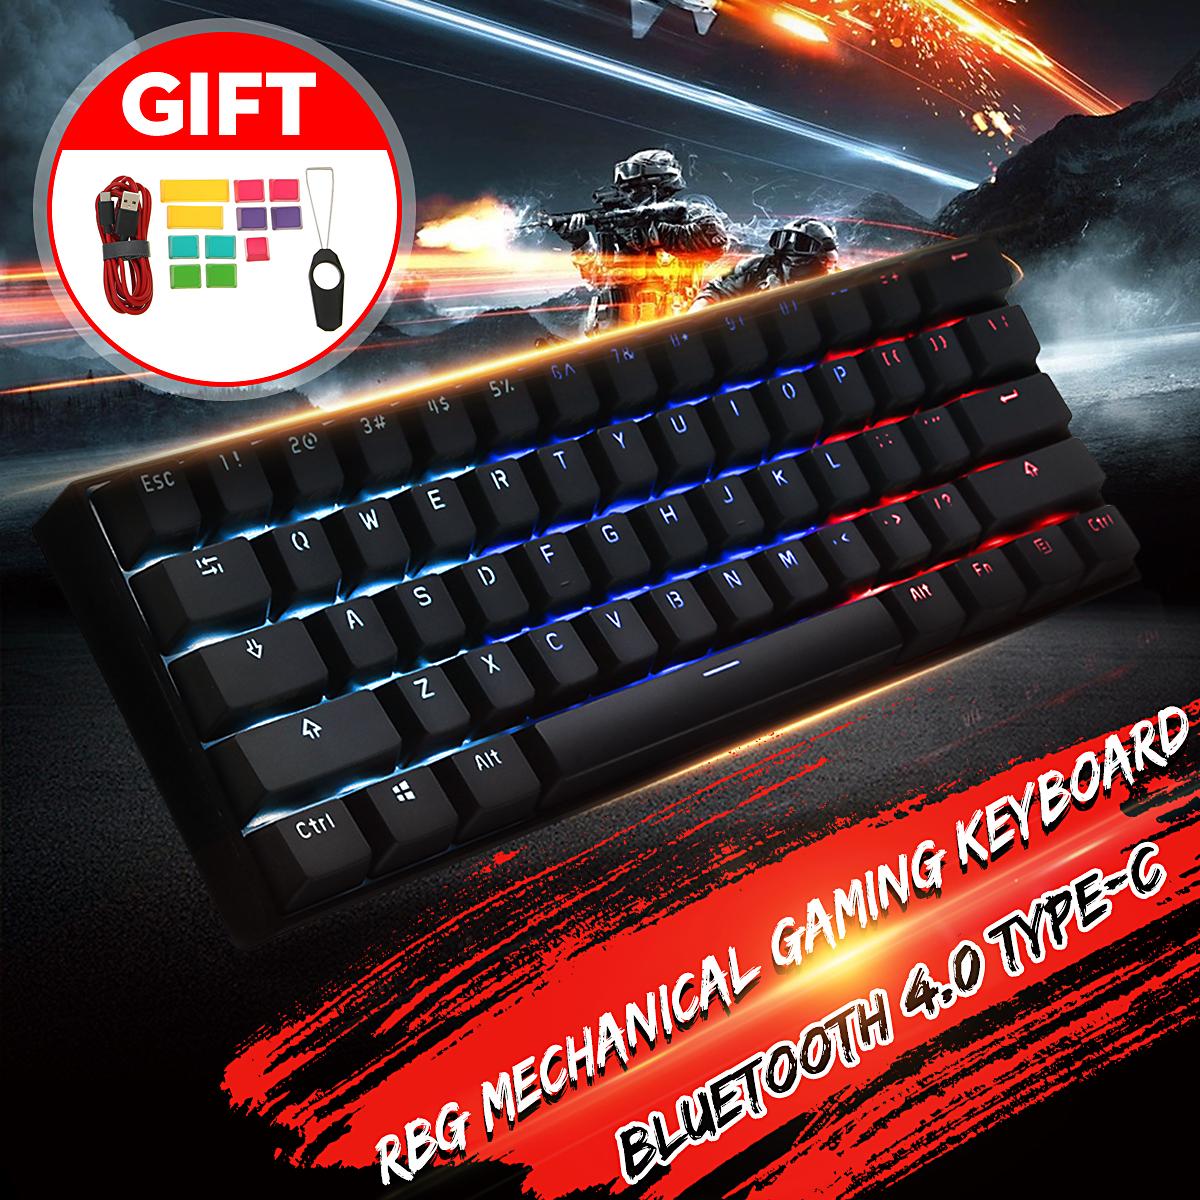 [Gateron Switch]Obins Anne Pro 2 60% NKRO bluetooth 4.0 Type-C RGB Wireless Mechanical Gaming Keyboard Keypad (Brown Switch)